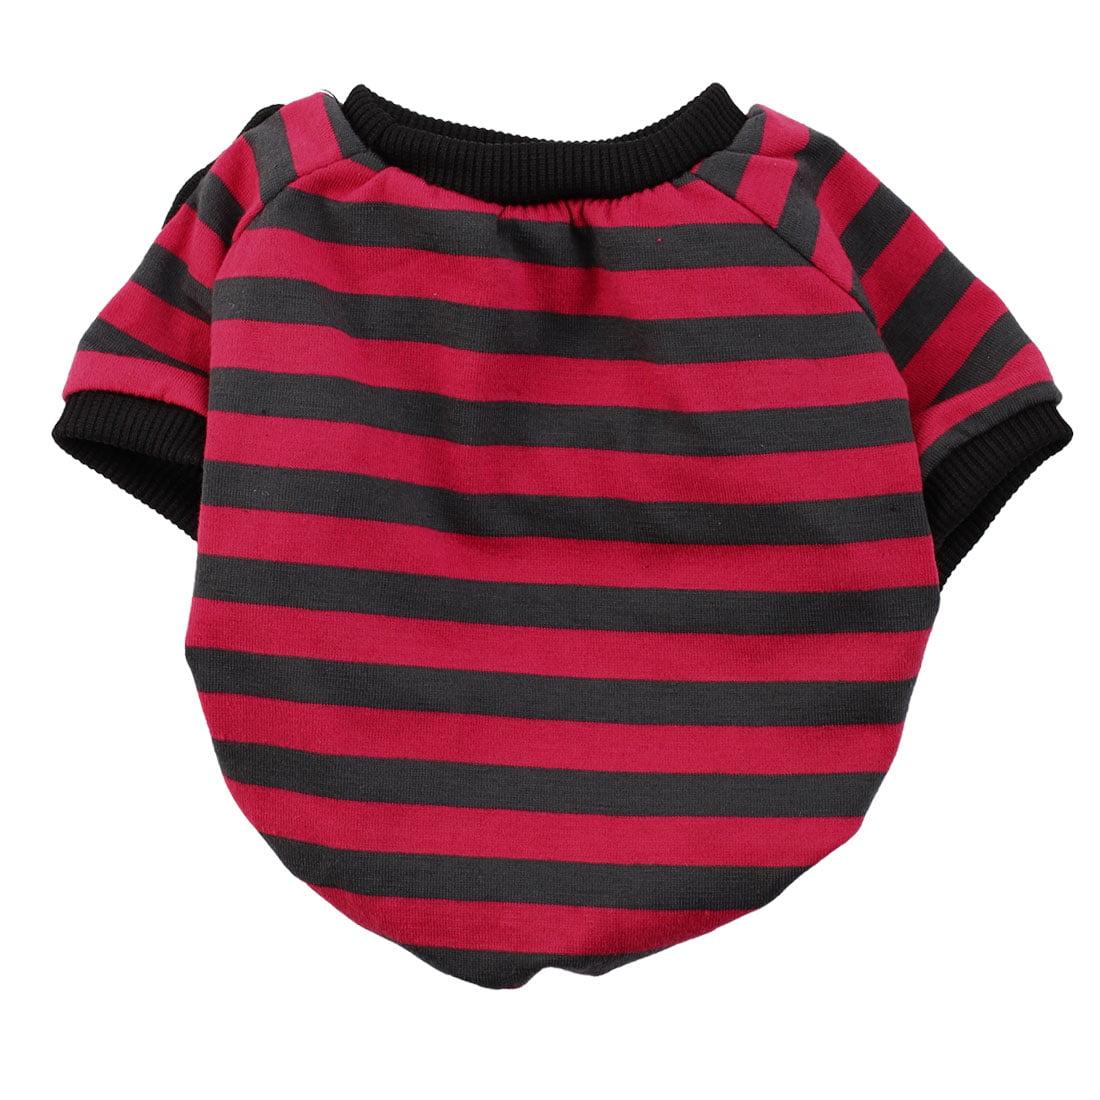 Pet Dog Cotton Fashion Coat Clothes T-shirt Apparel Red Black S